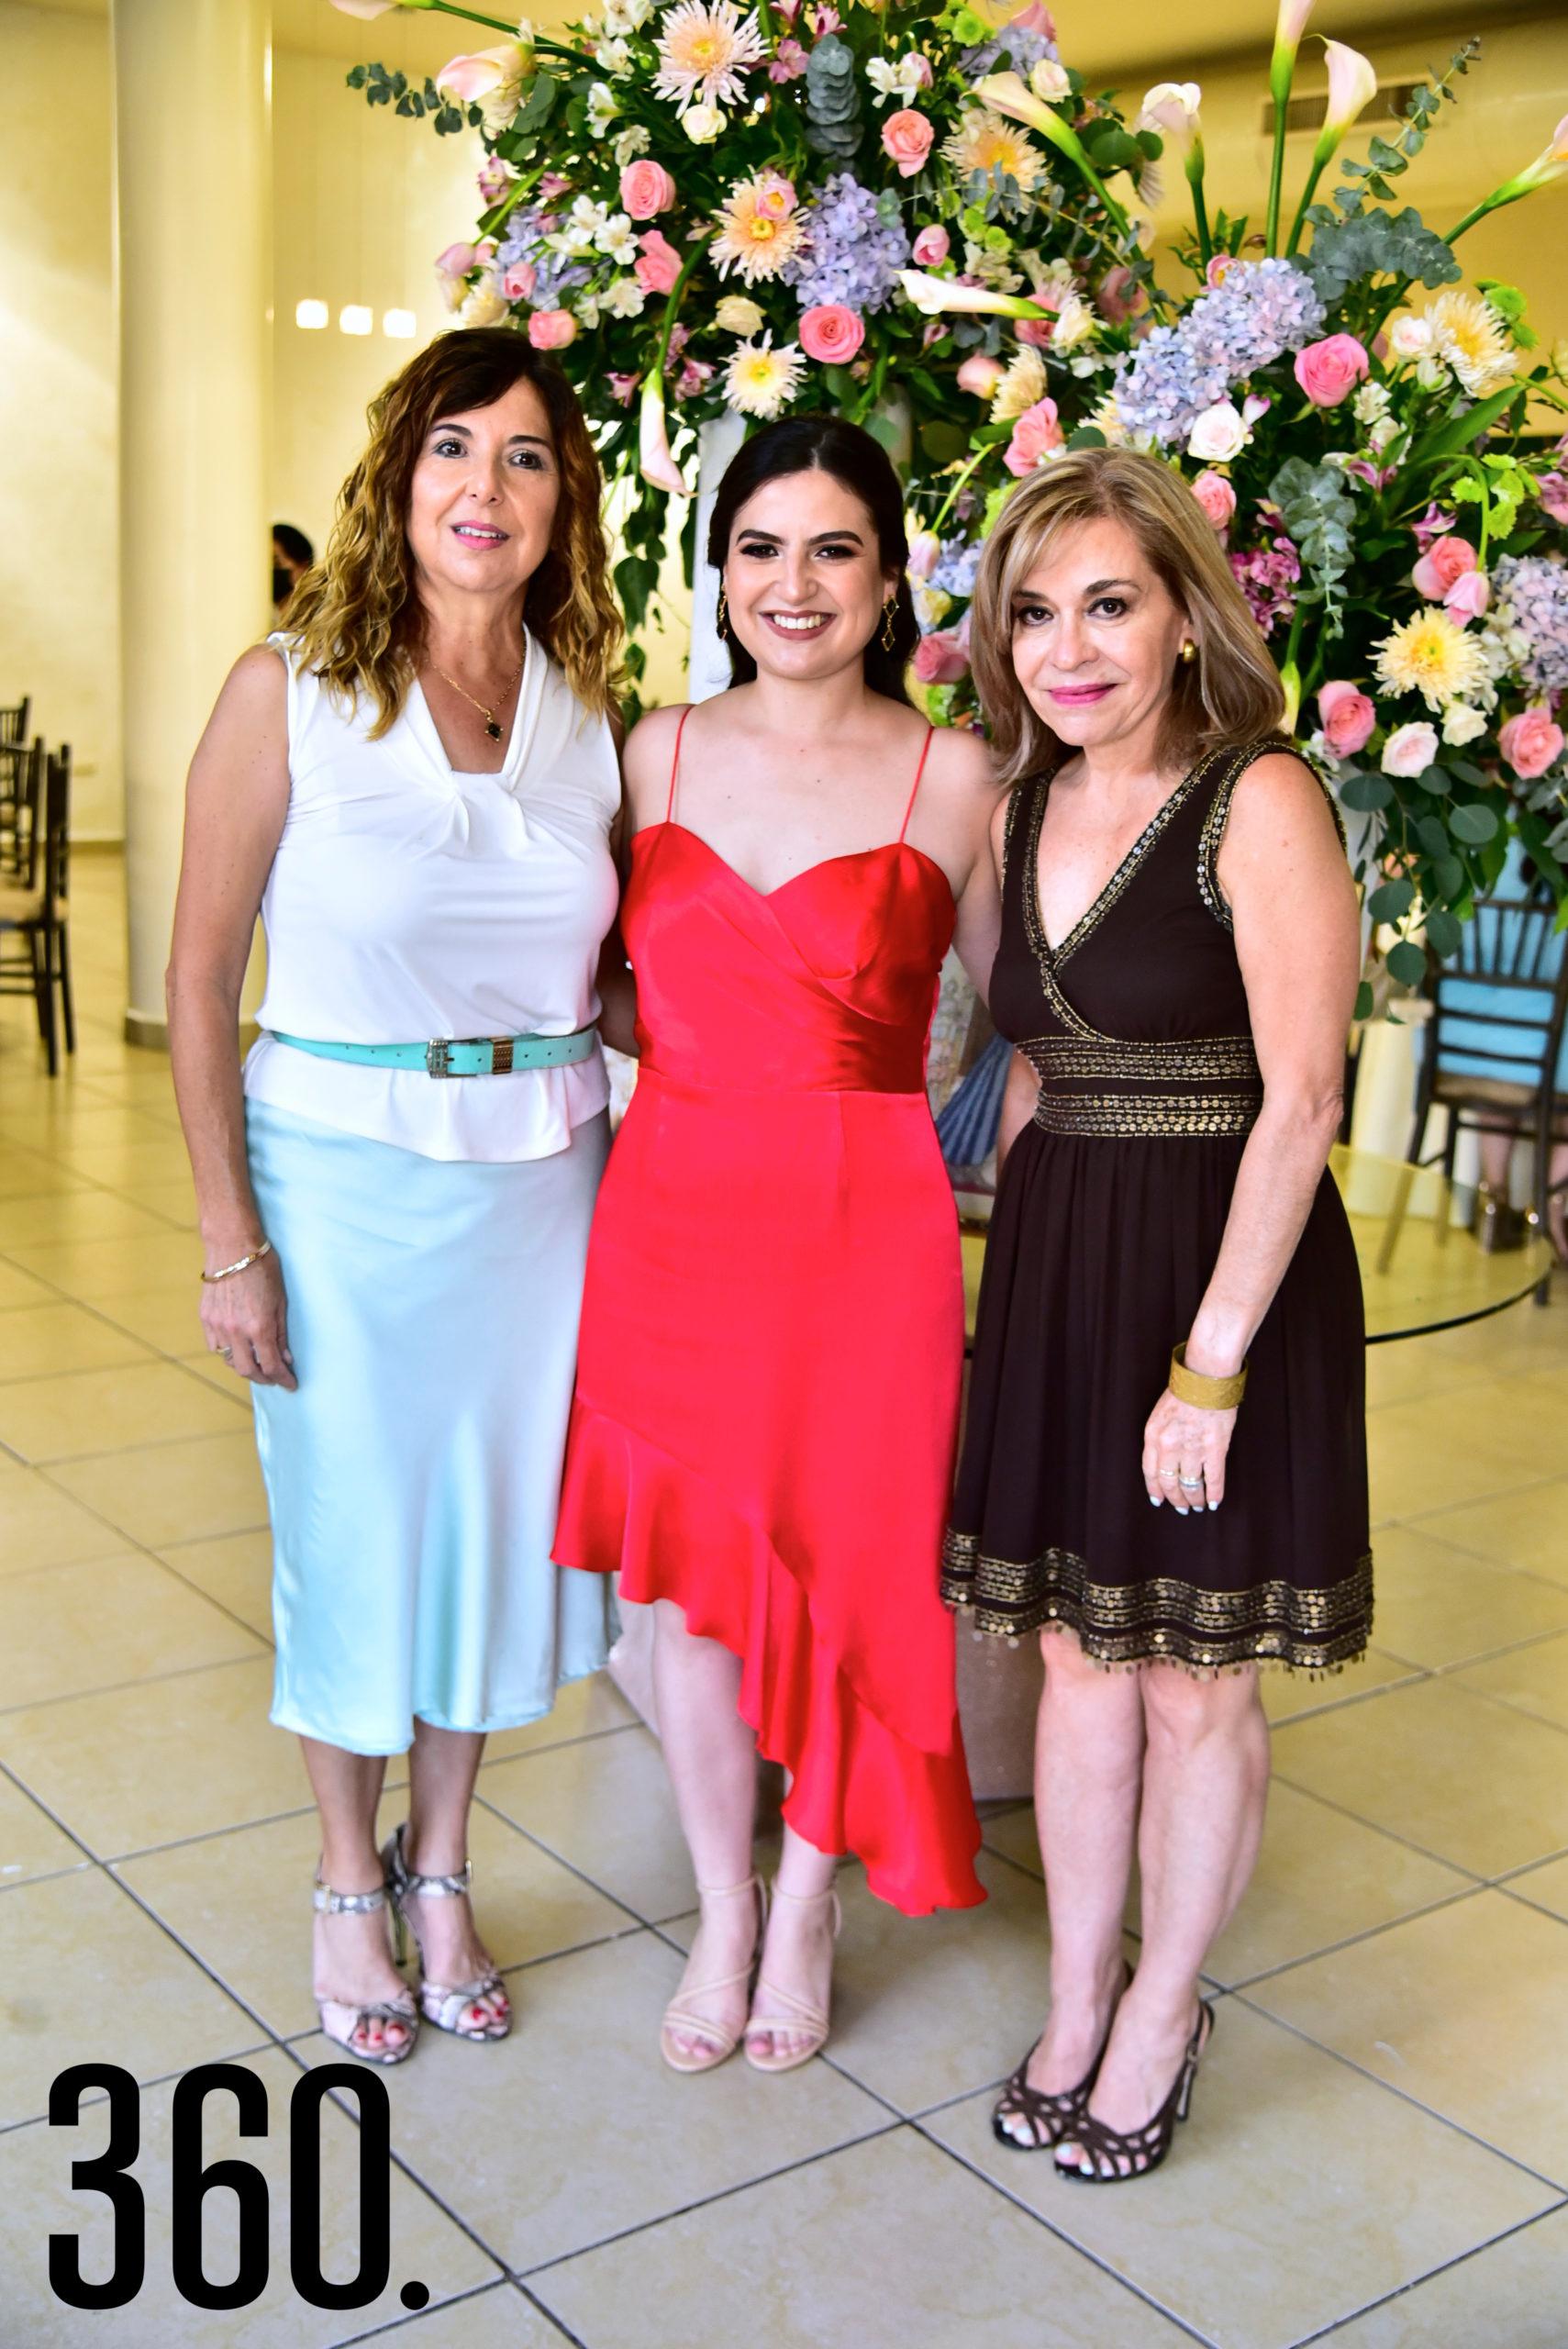 Lidia Saucedo, Ana Sofía Saucedo Orta y Sara Orta.